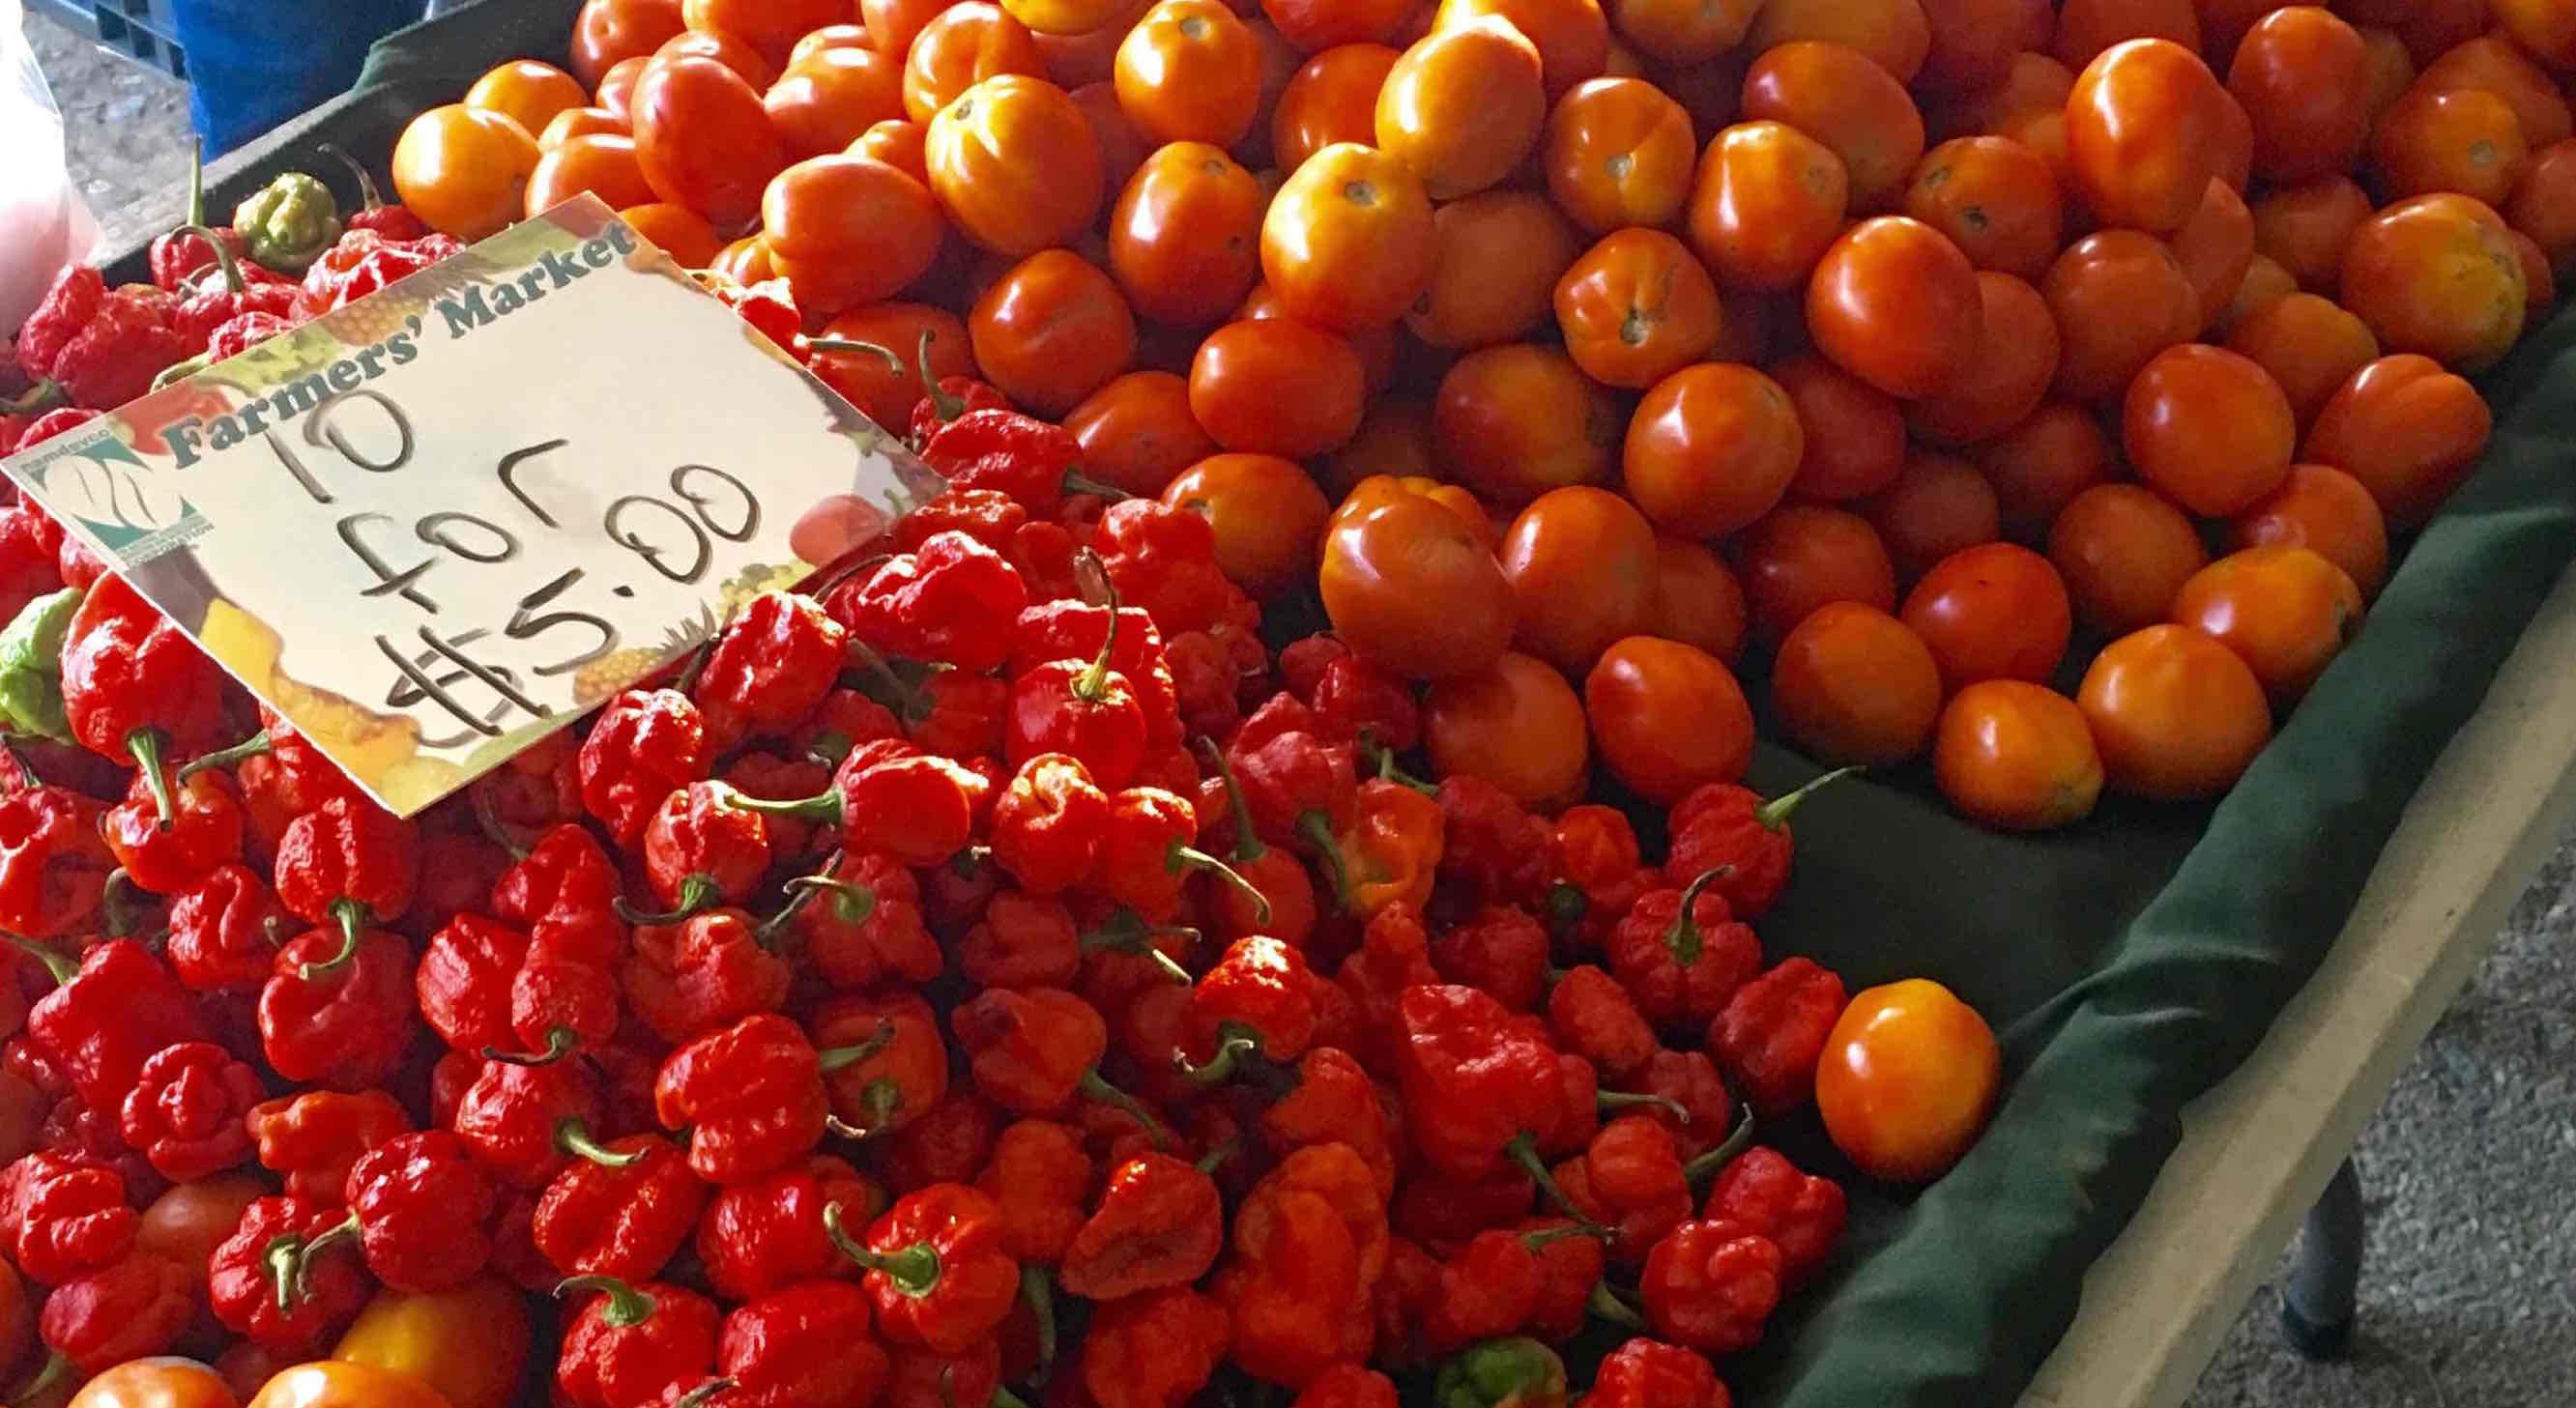 Savannah Market